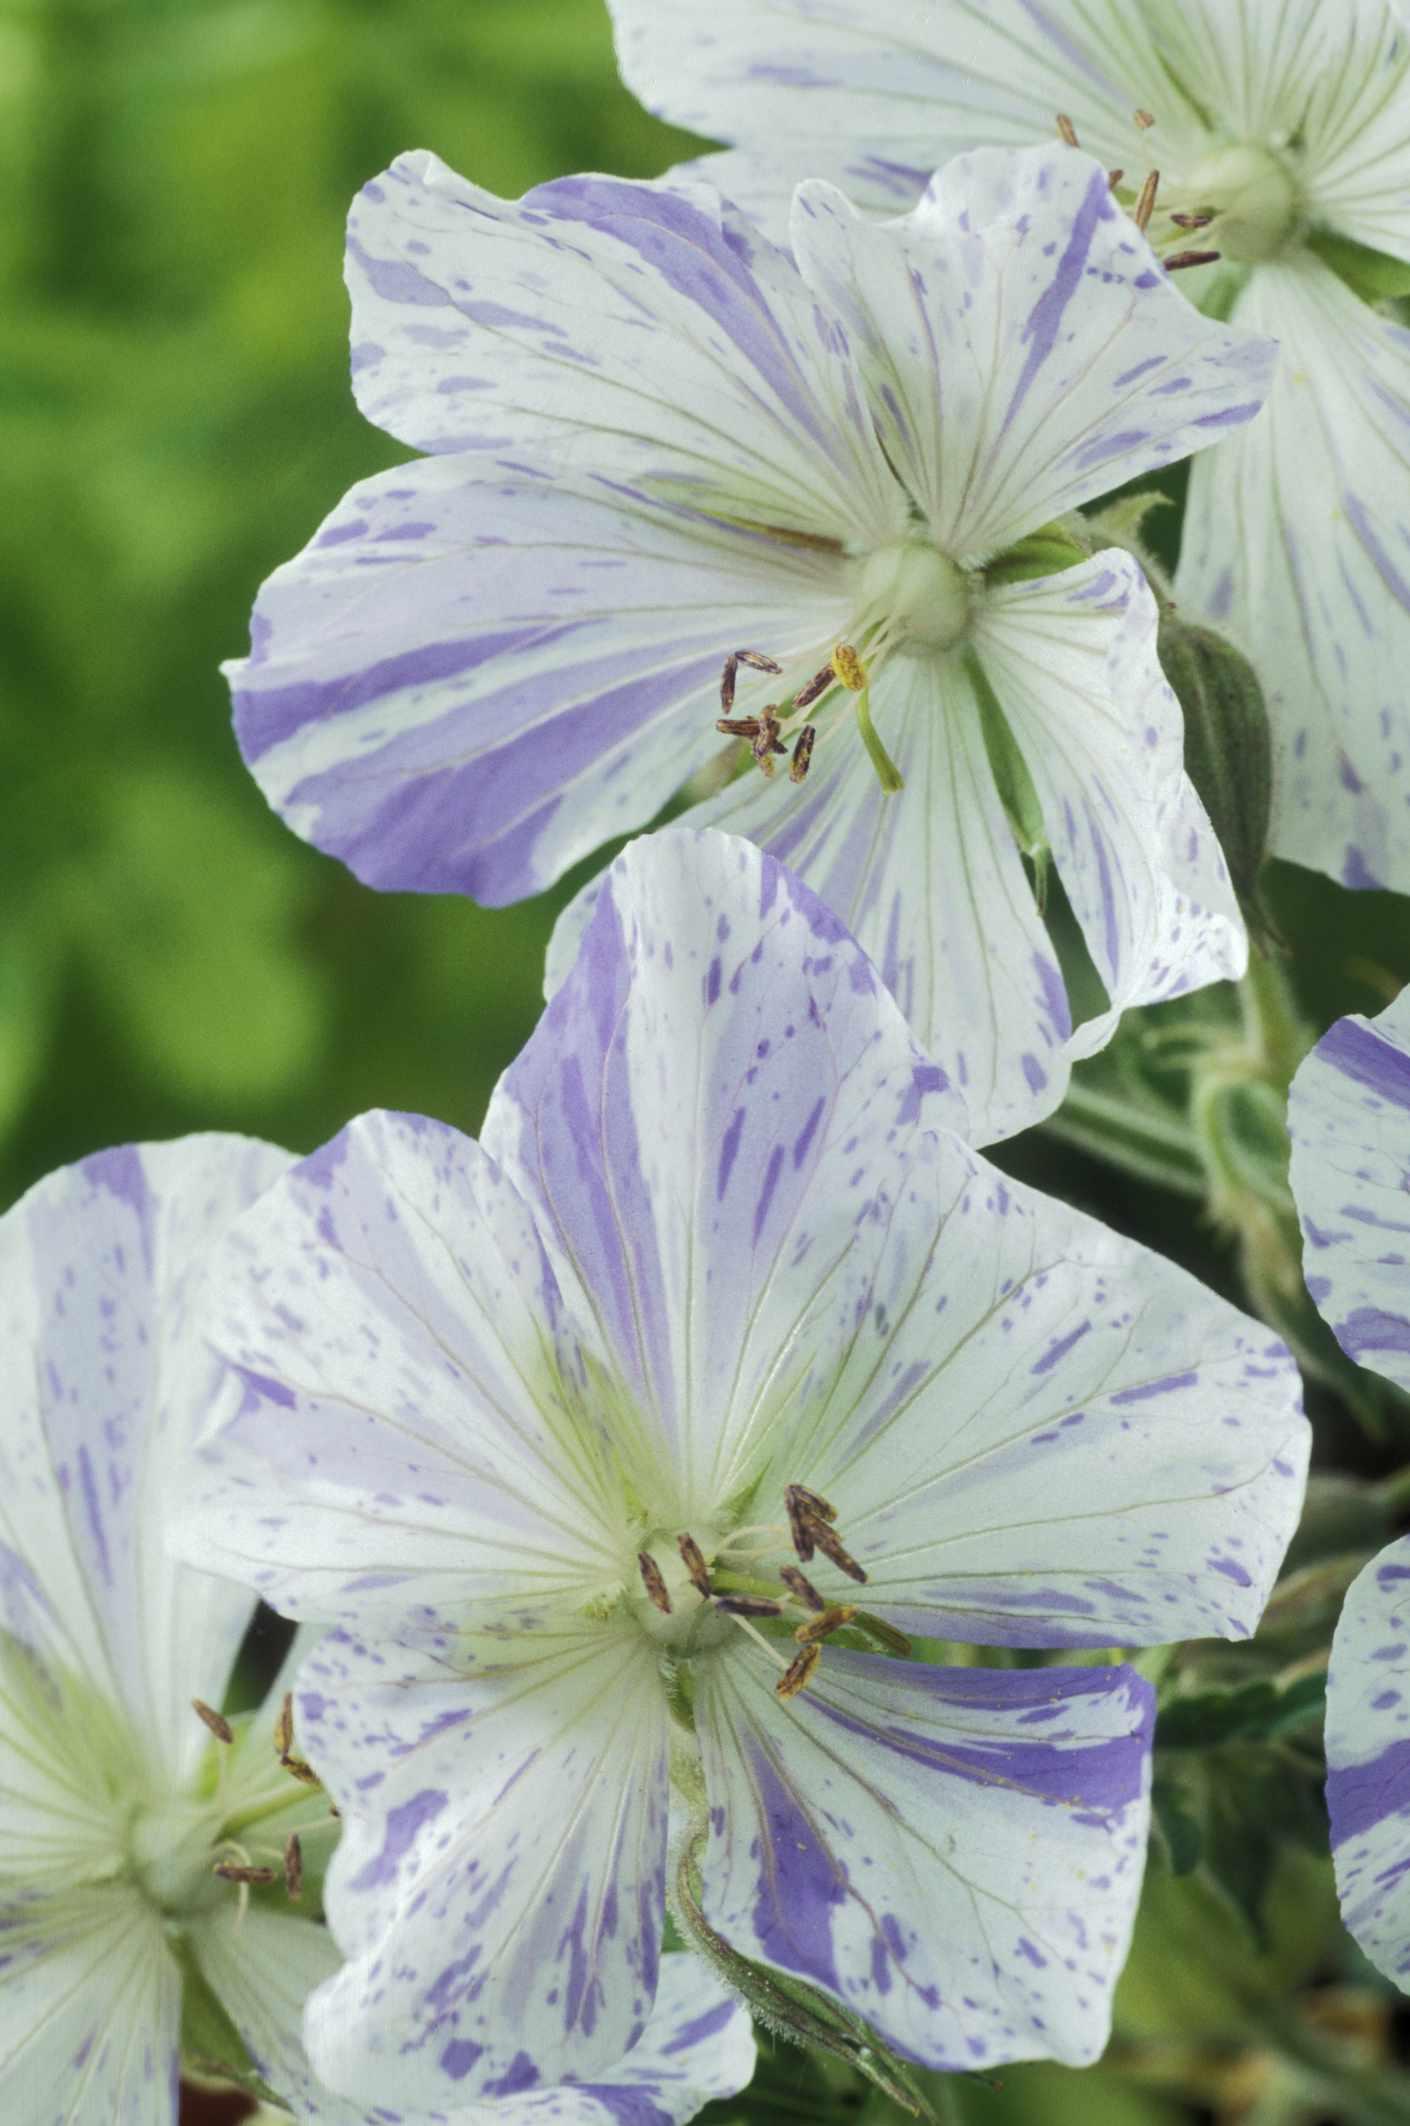 'Splish Splash' geranium with purple-flecked white petals